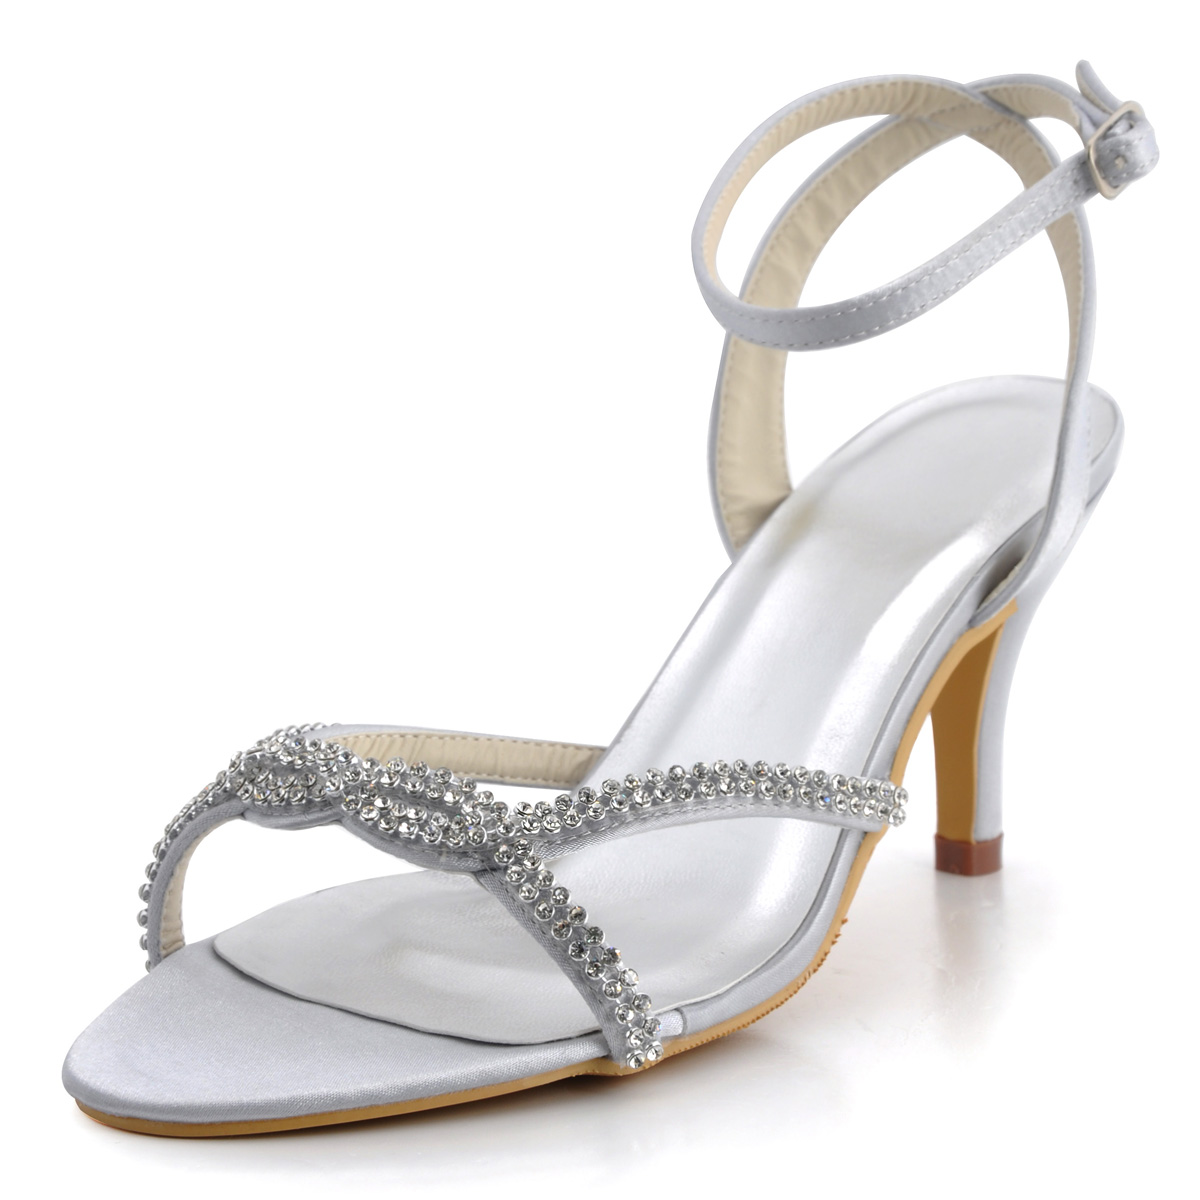 Silver sandals or shoes - Woman Summer High Heel Sandals Ep2056 Silver Open Toe Rhinestones Satin Bride Bridesmaid Wedding Bridal Party